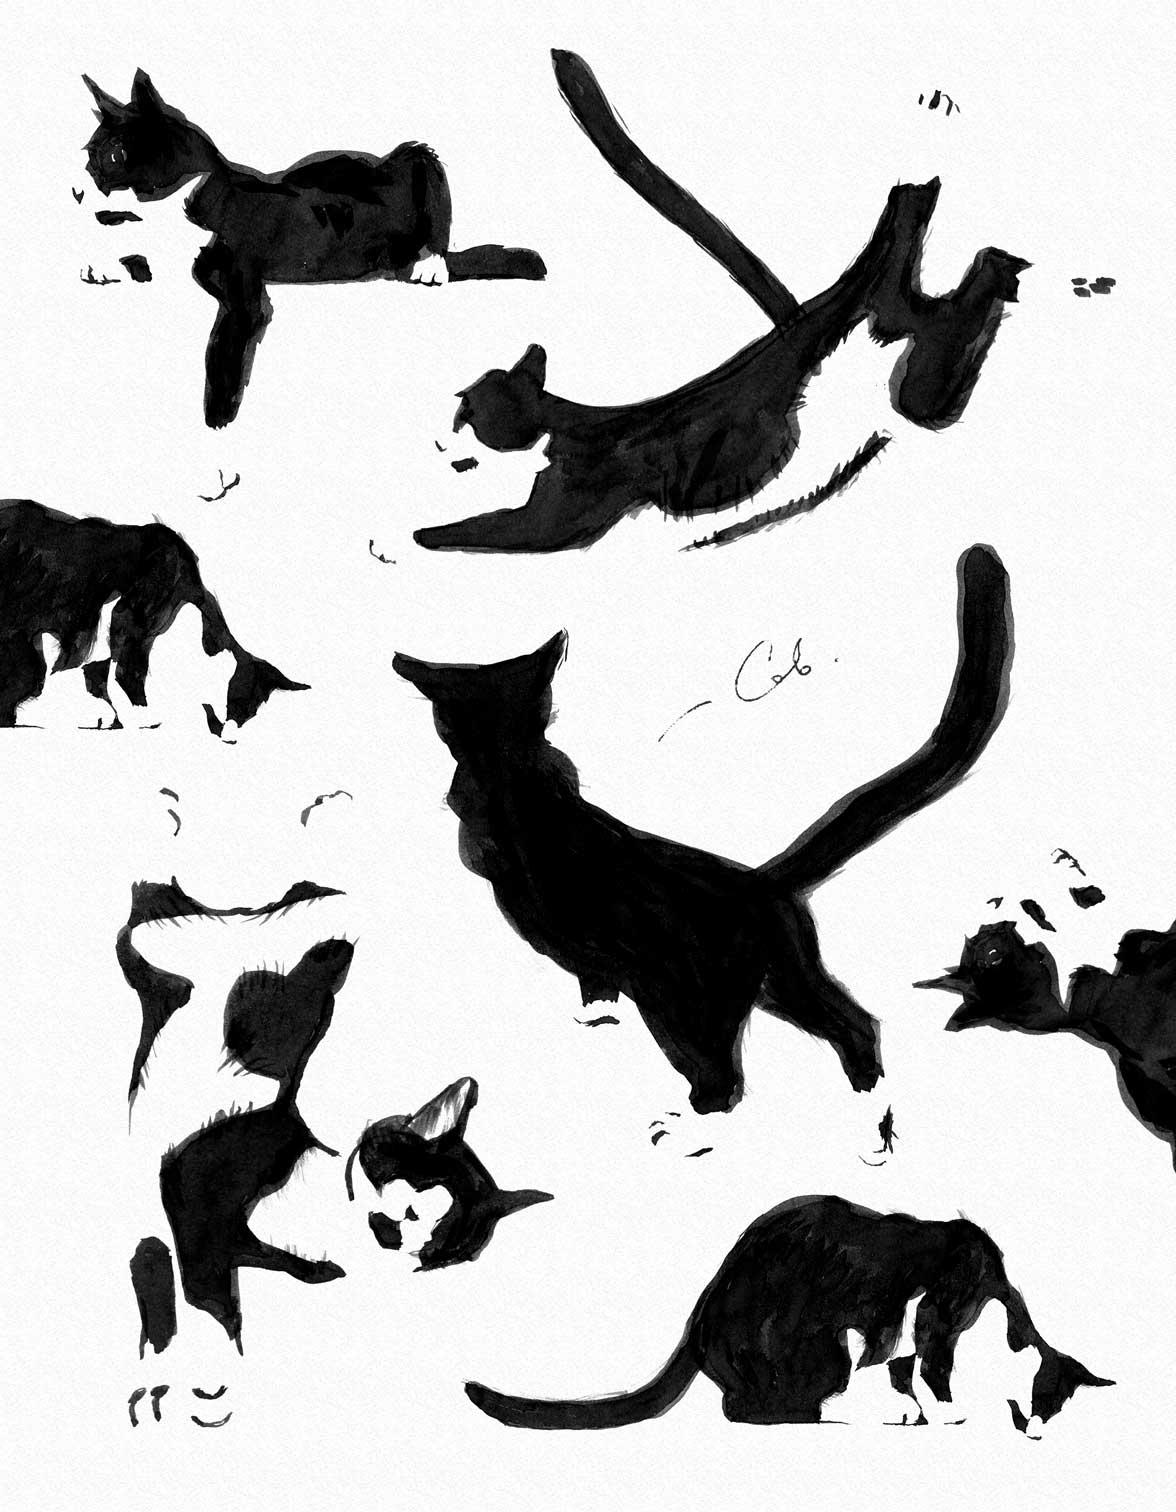 Косатики 2018, chartam, atramento, 70х90, кот, кошка